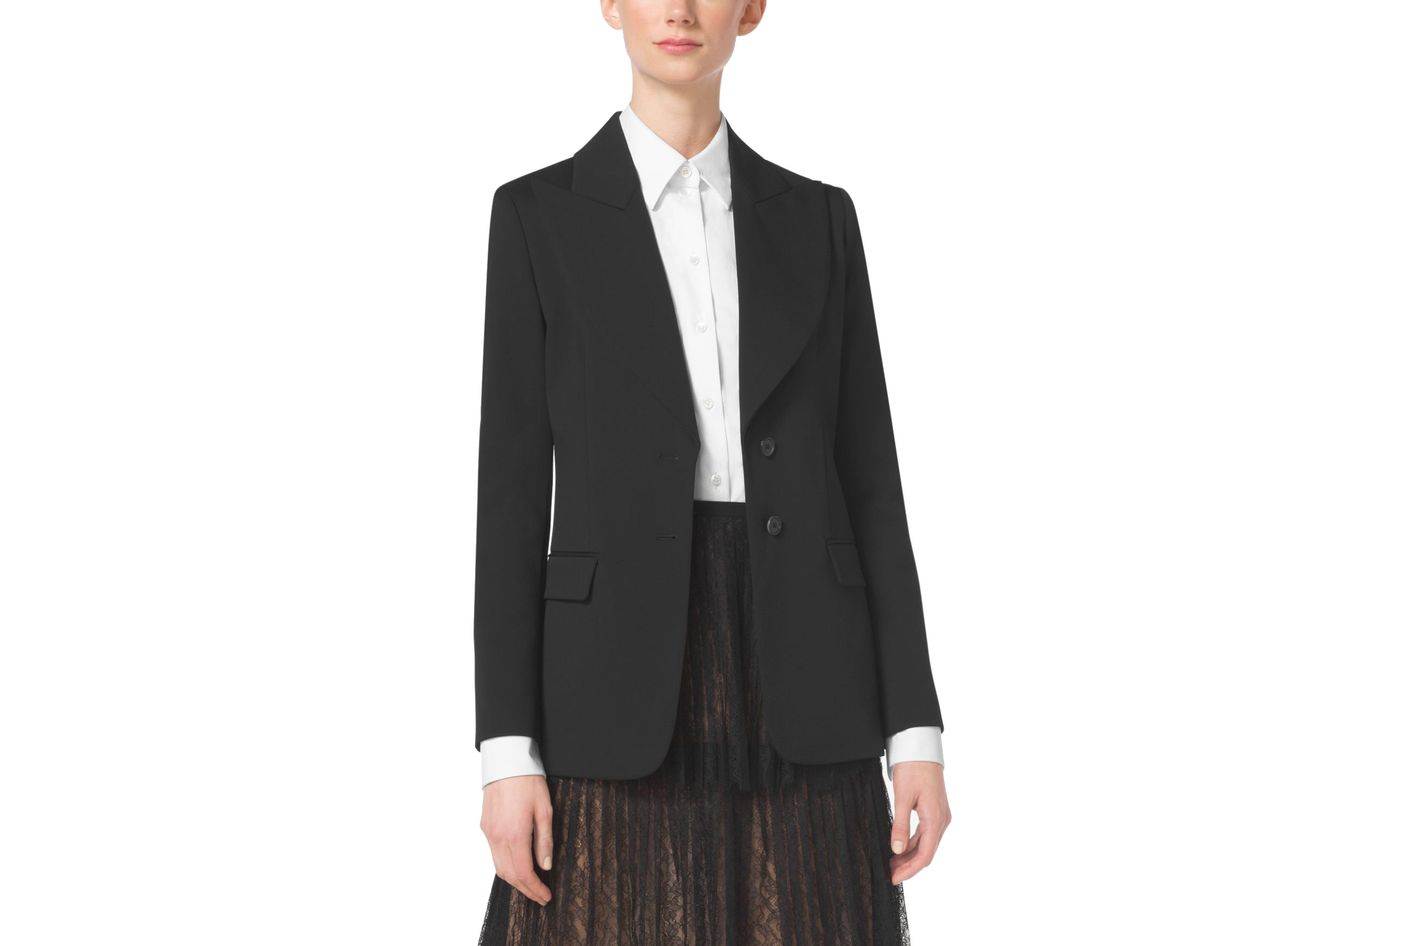 Michael Kors Collection Wool-Gabardine Jacket